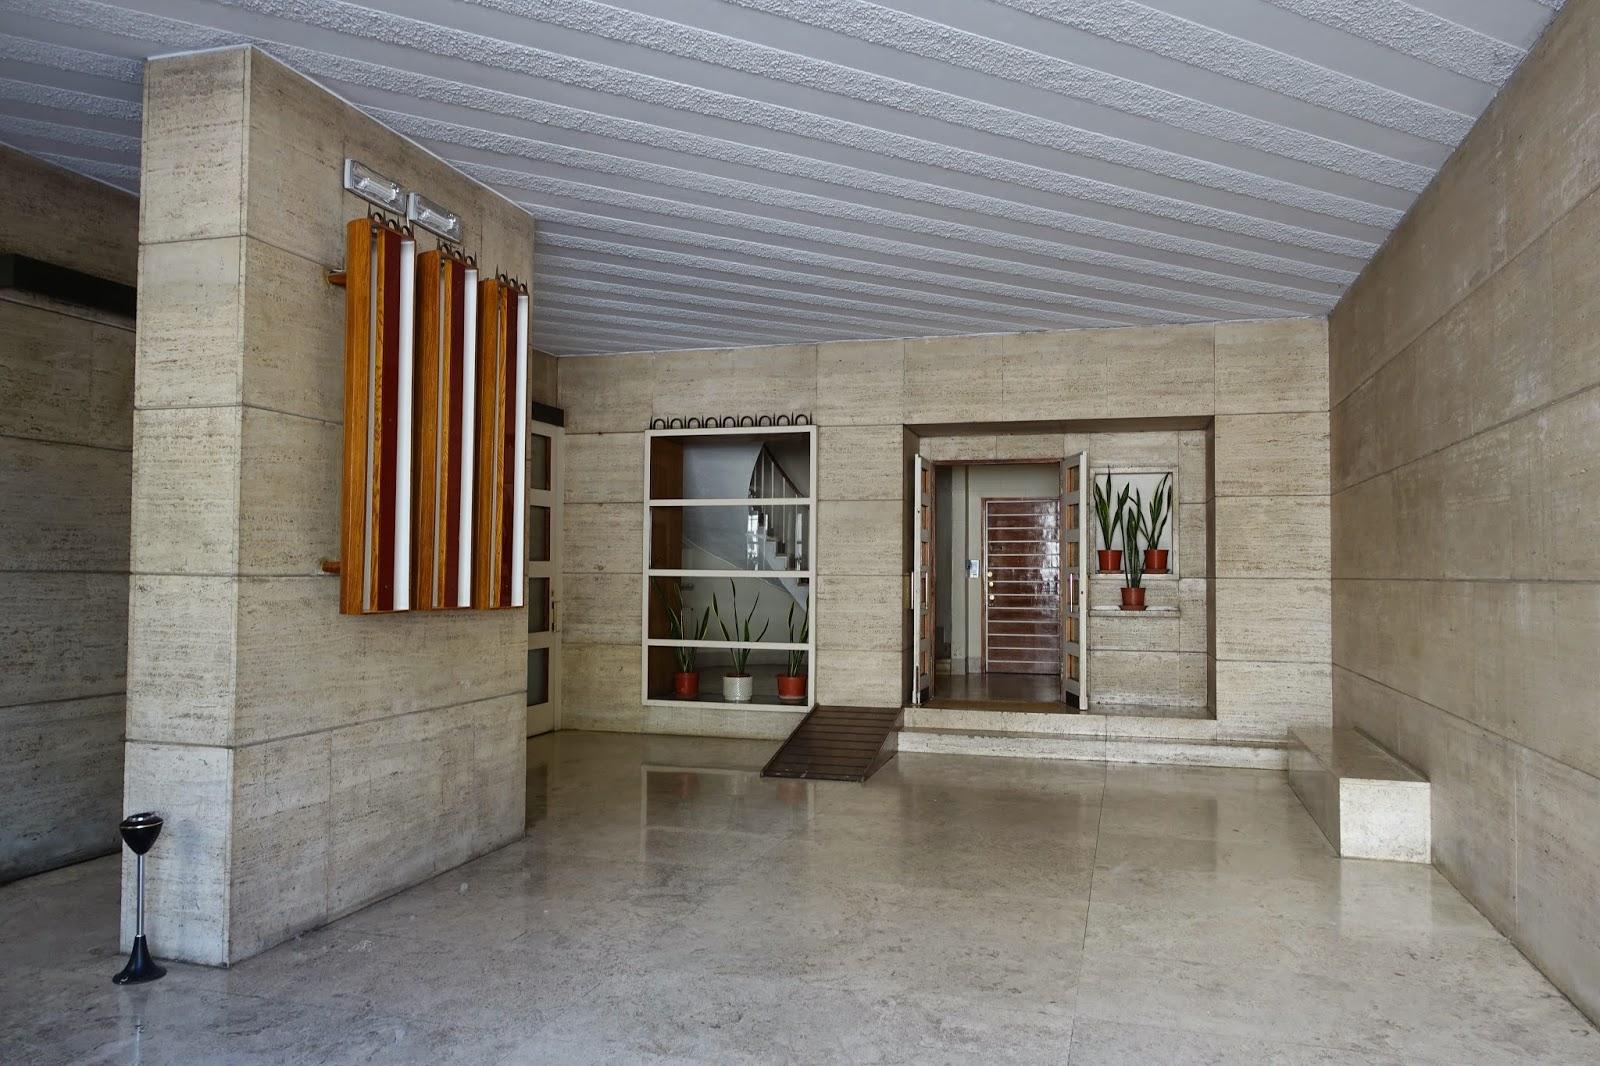 Apartment Building Foyer : Apartment building entryway pixshark images